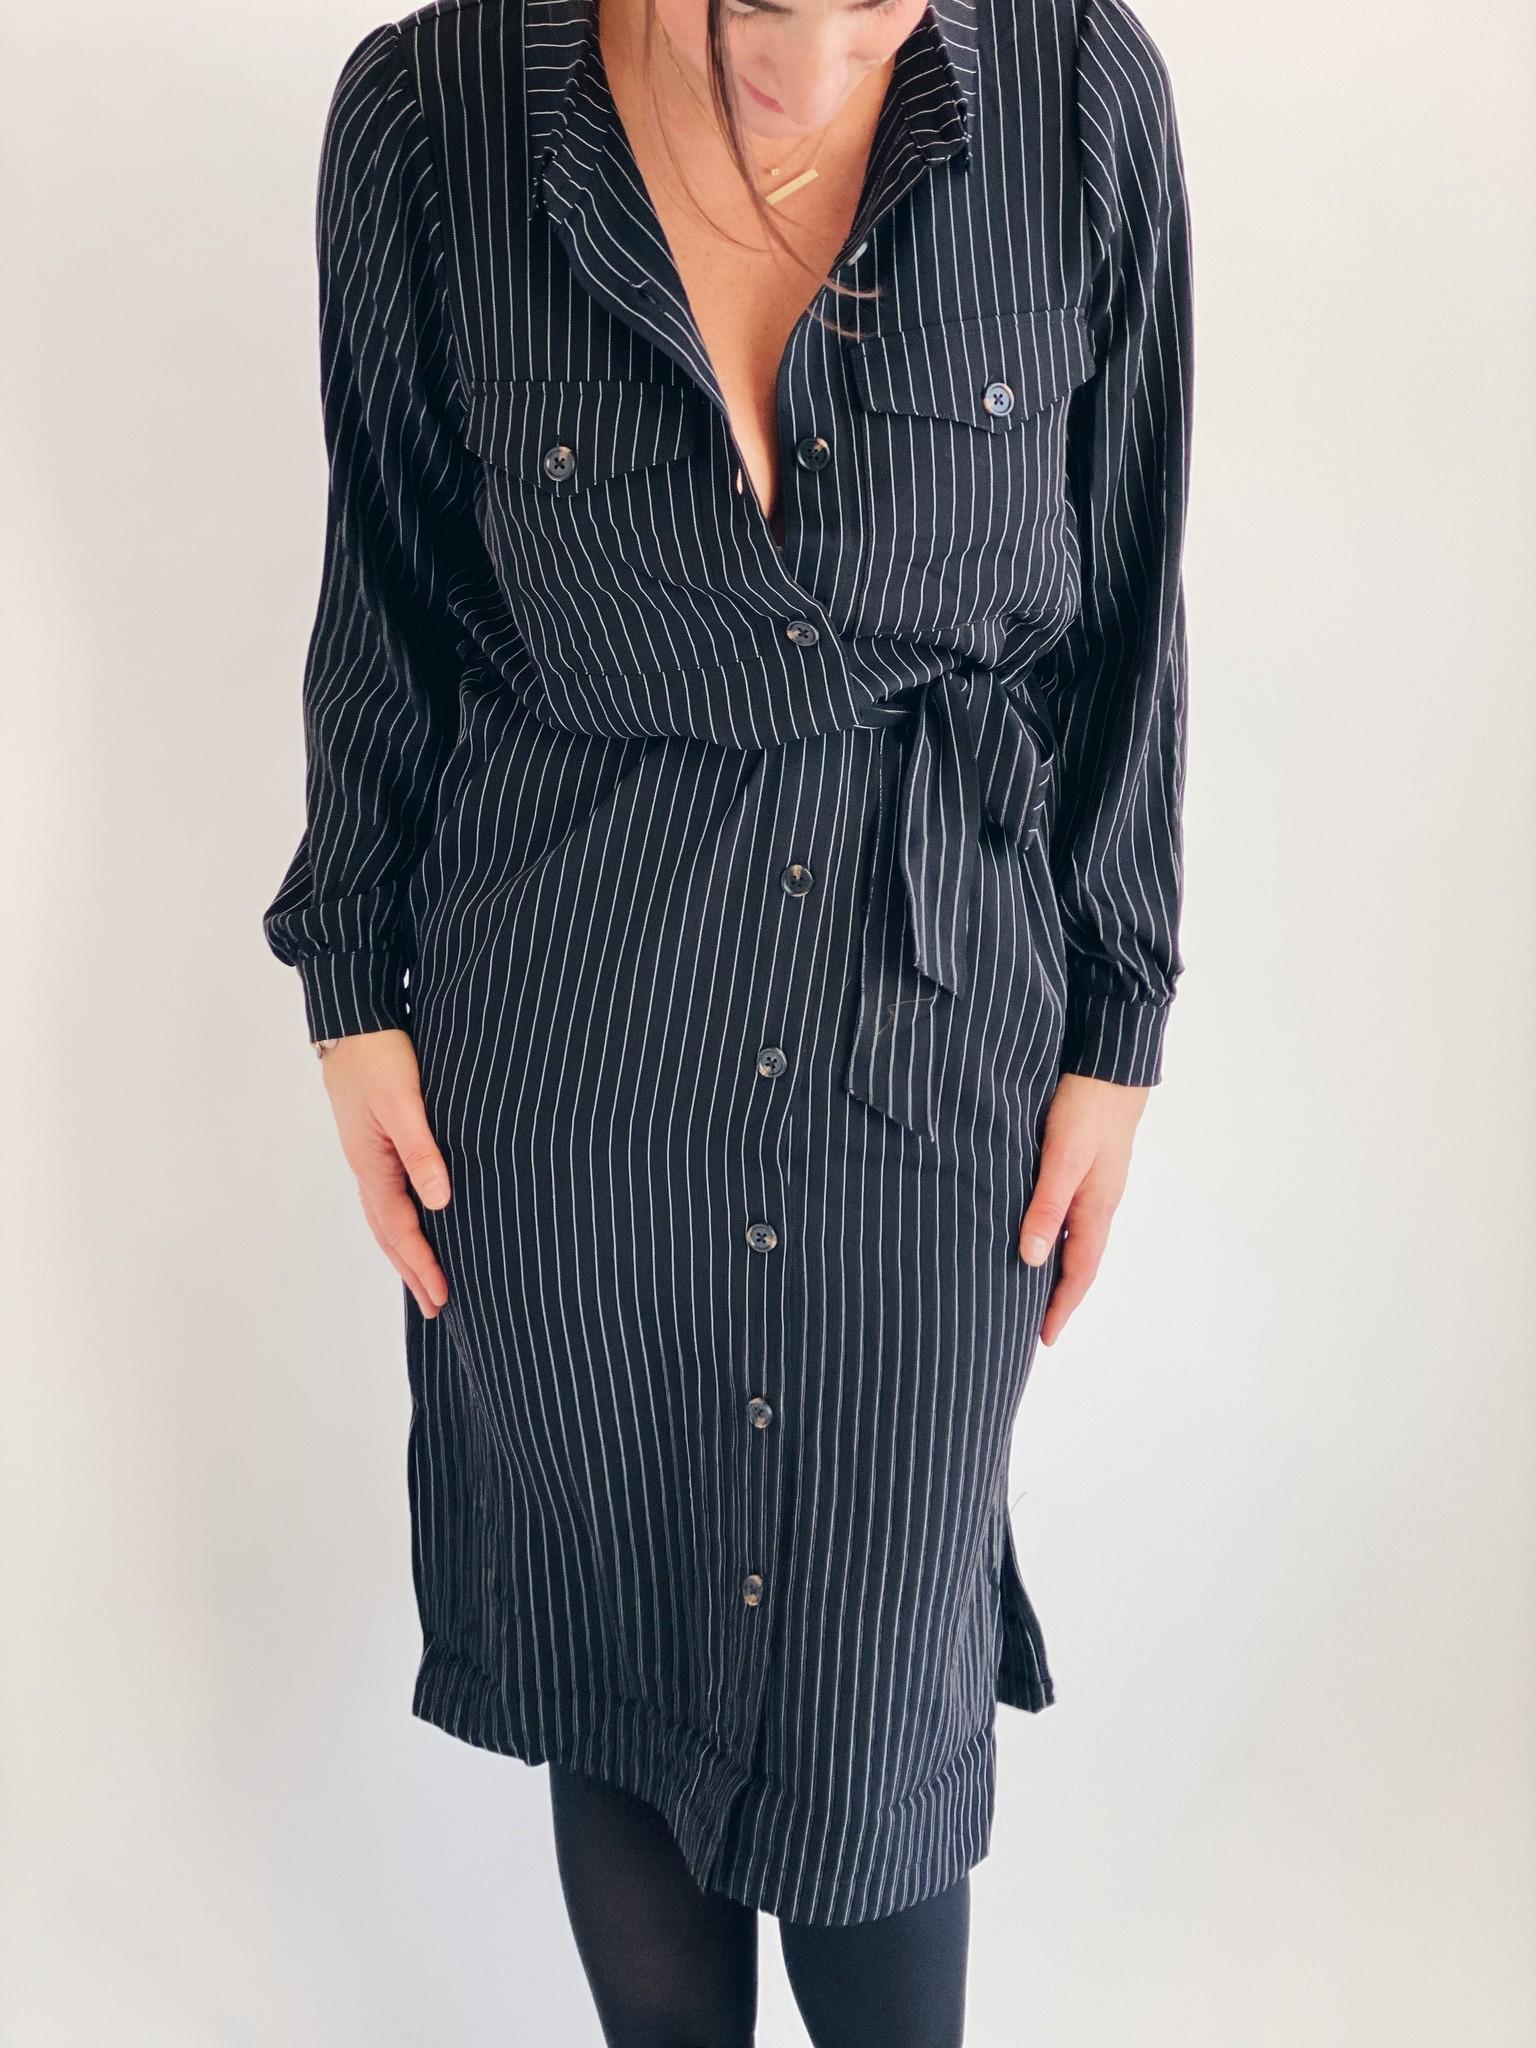 Jurk kagaye shirt dress black pinstripe-3